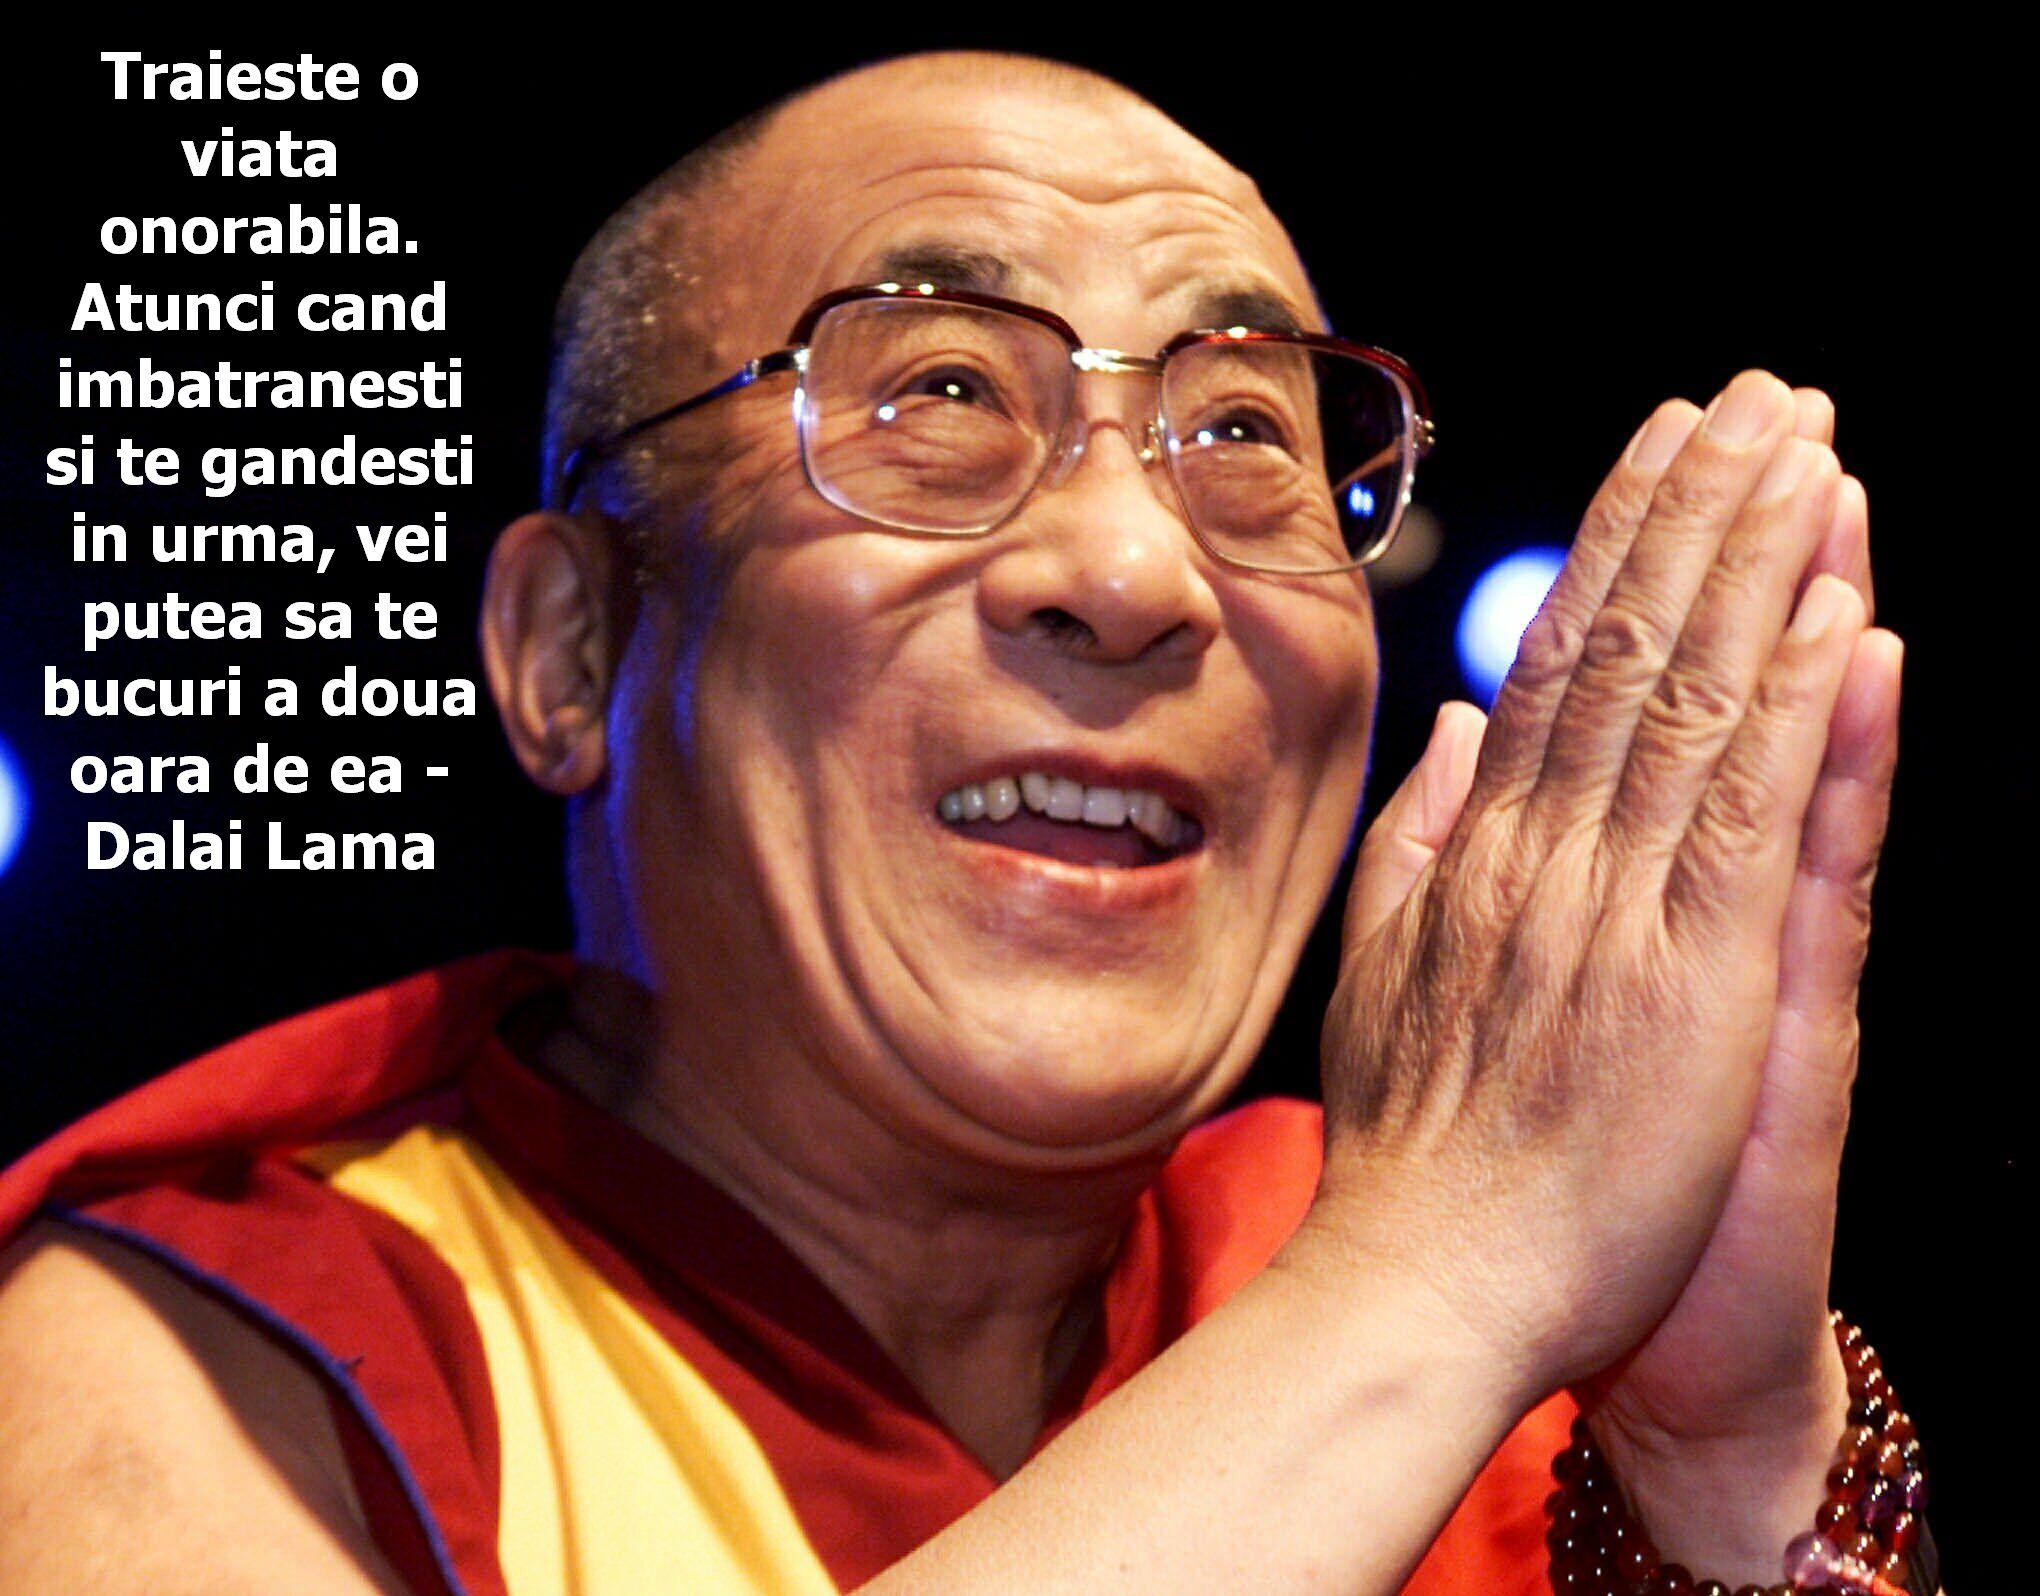 Traieste o viata onorabila. Atunci cand imbatranesti si te gandesti in urma, vei putea sa te bucuri a doua oara de ea – Dalai Lama